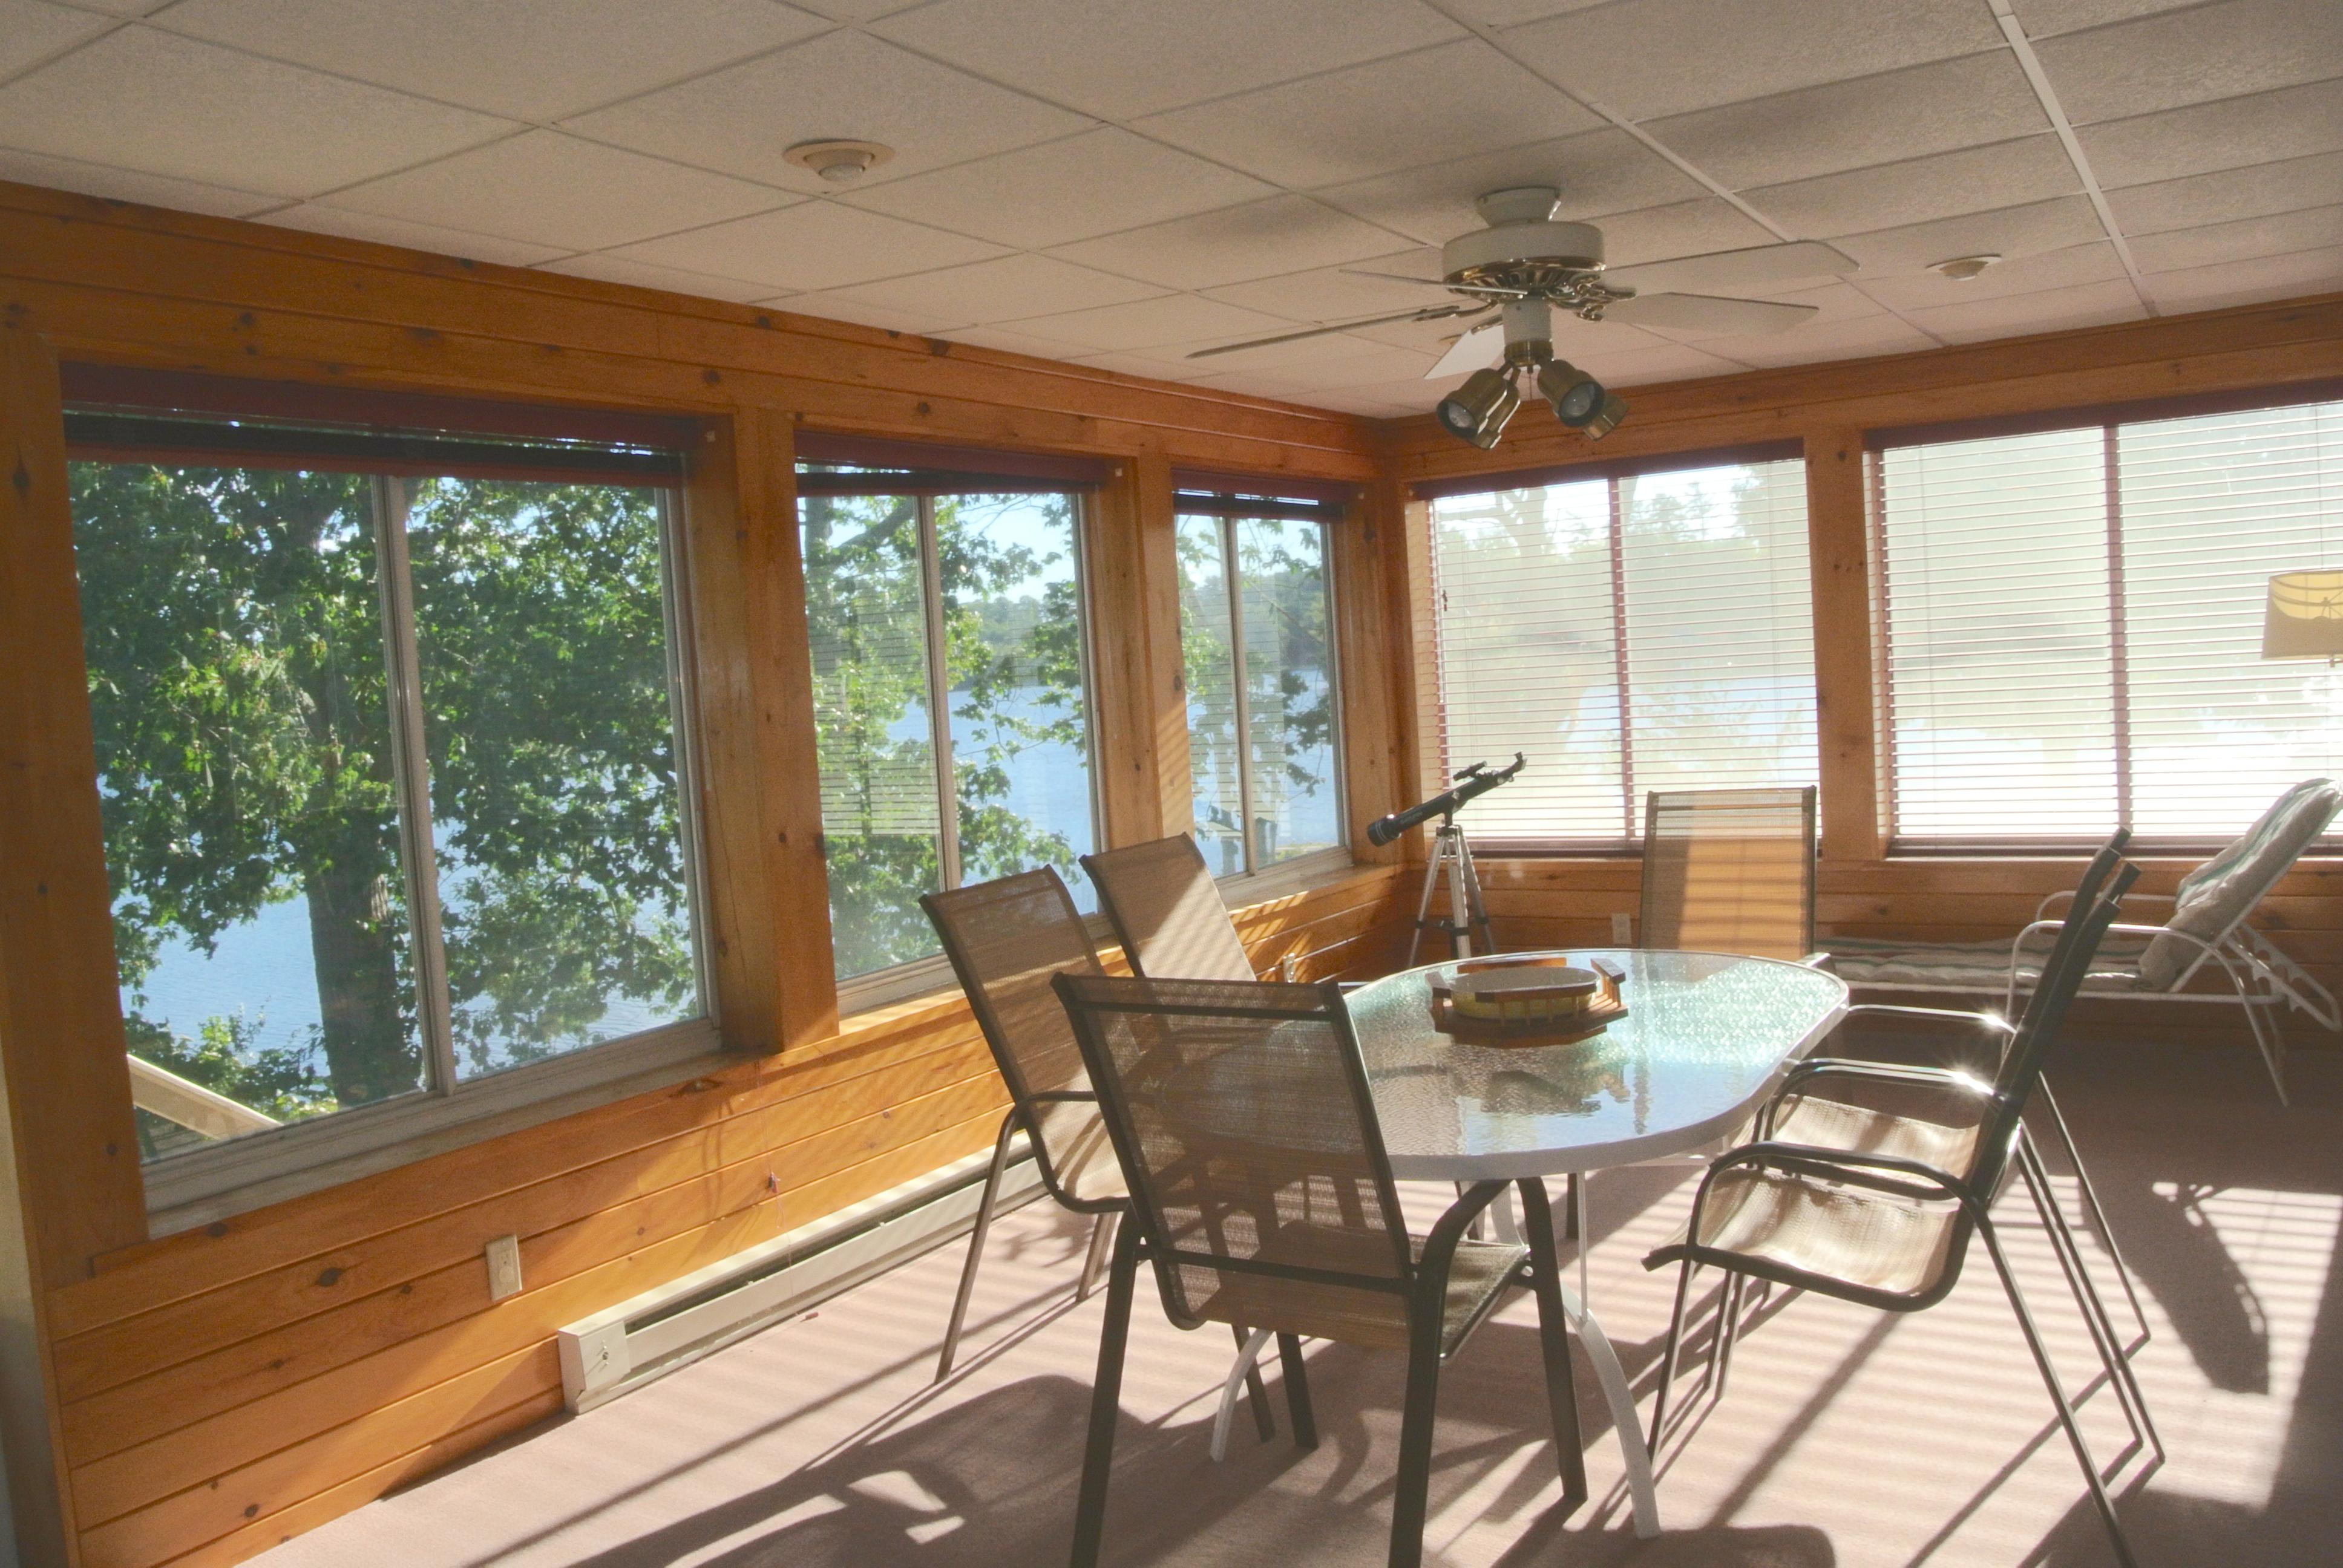 Lake Winnisquam Real Estate views for porch